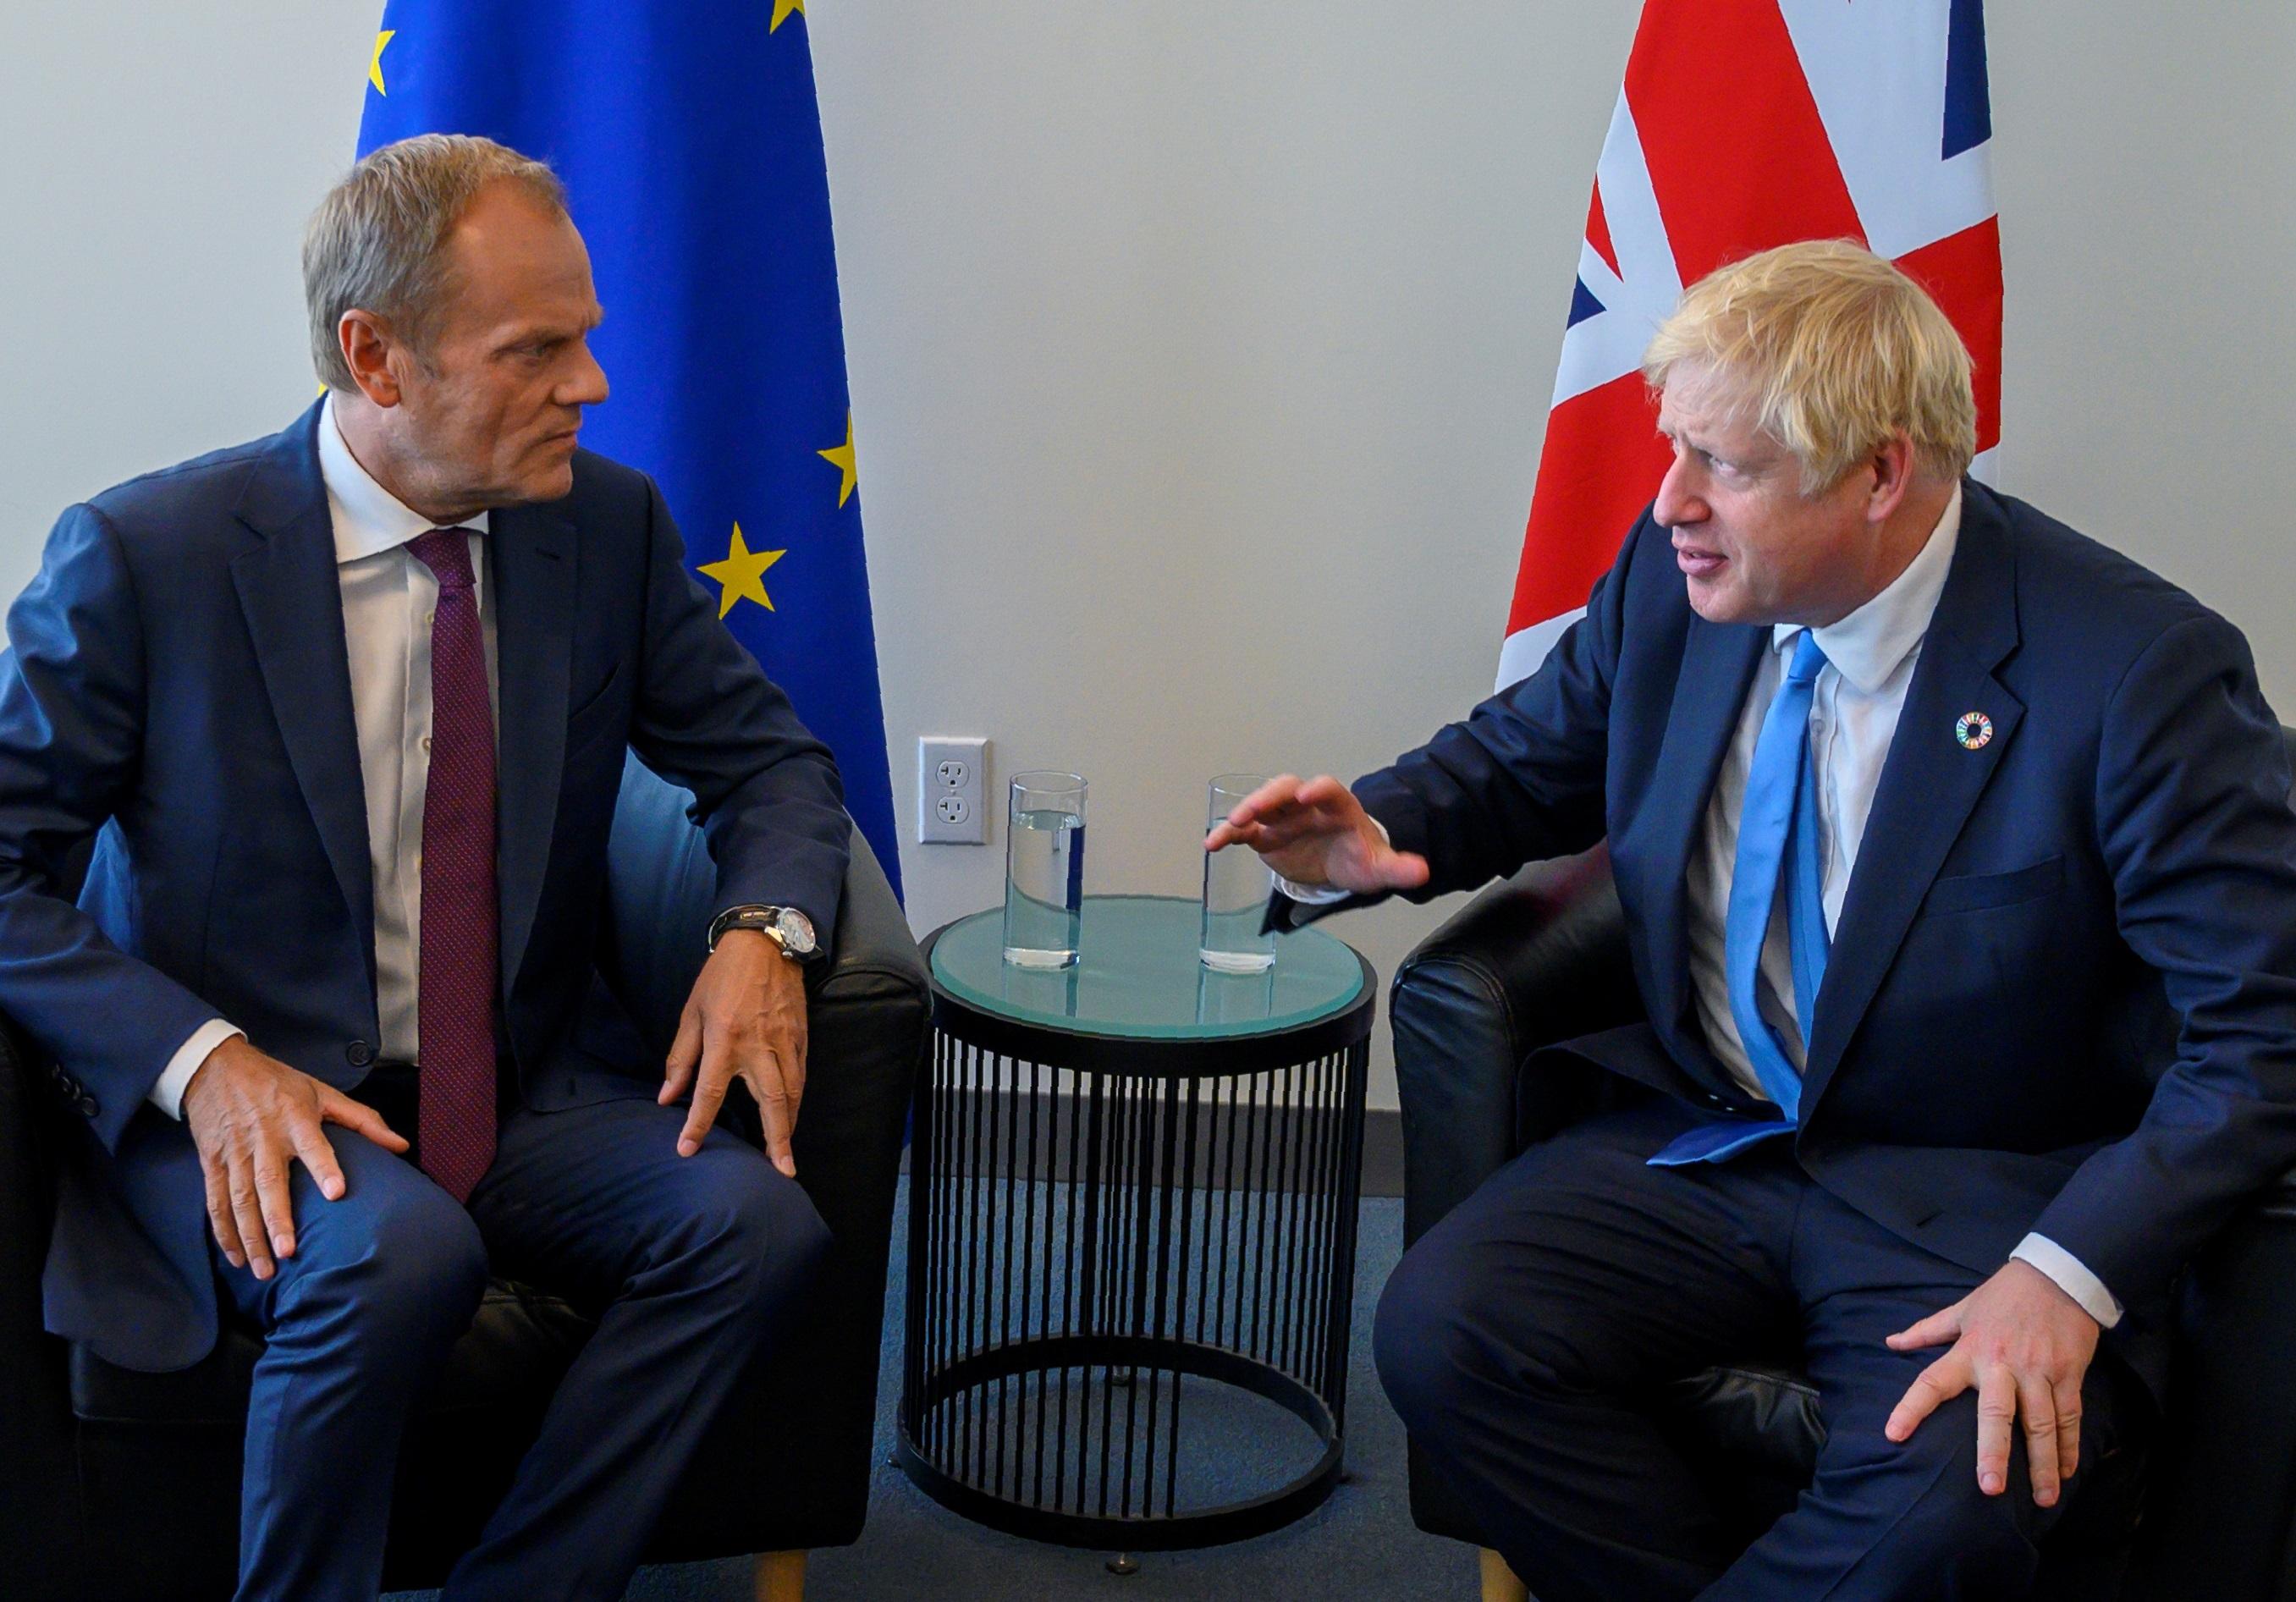 Brexit: Έξαλλος ο Ντόναλντ Τουσκ με τον Μπόρις Τζόνσον